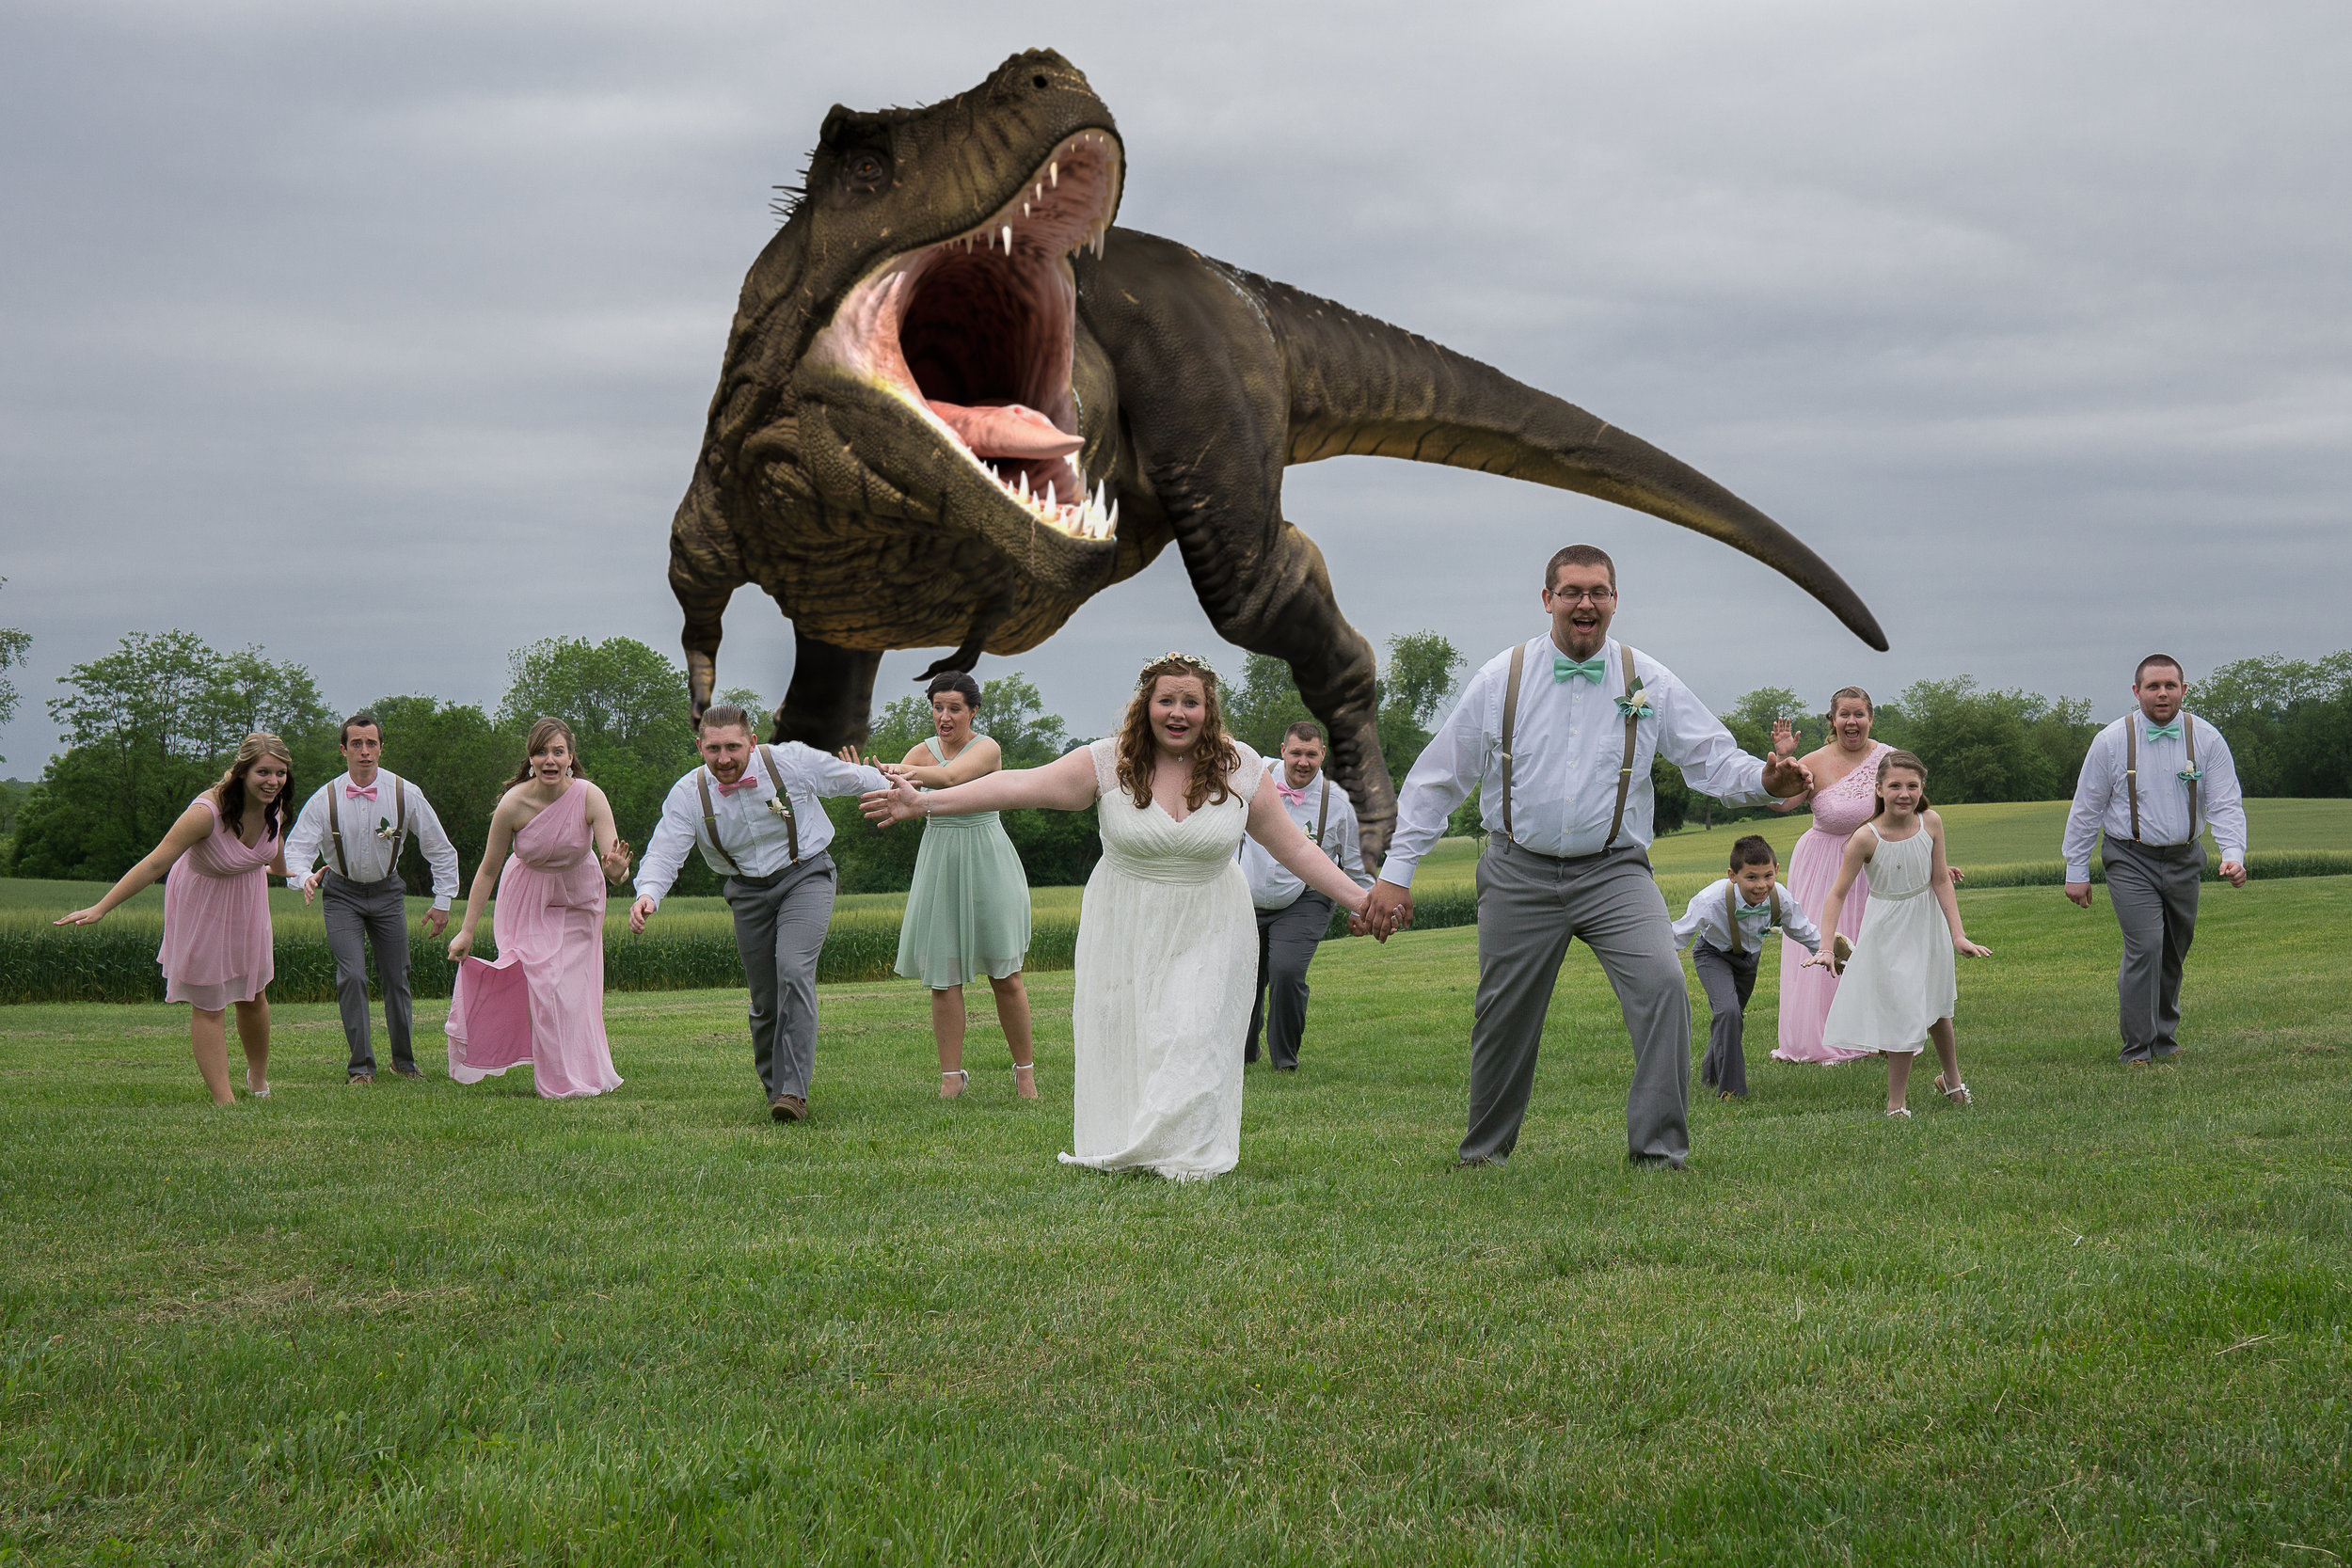 funny bridal party photos, photoshop